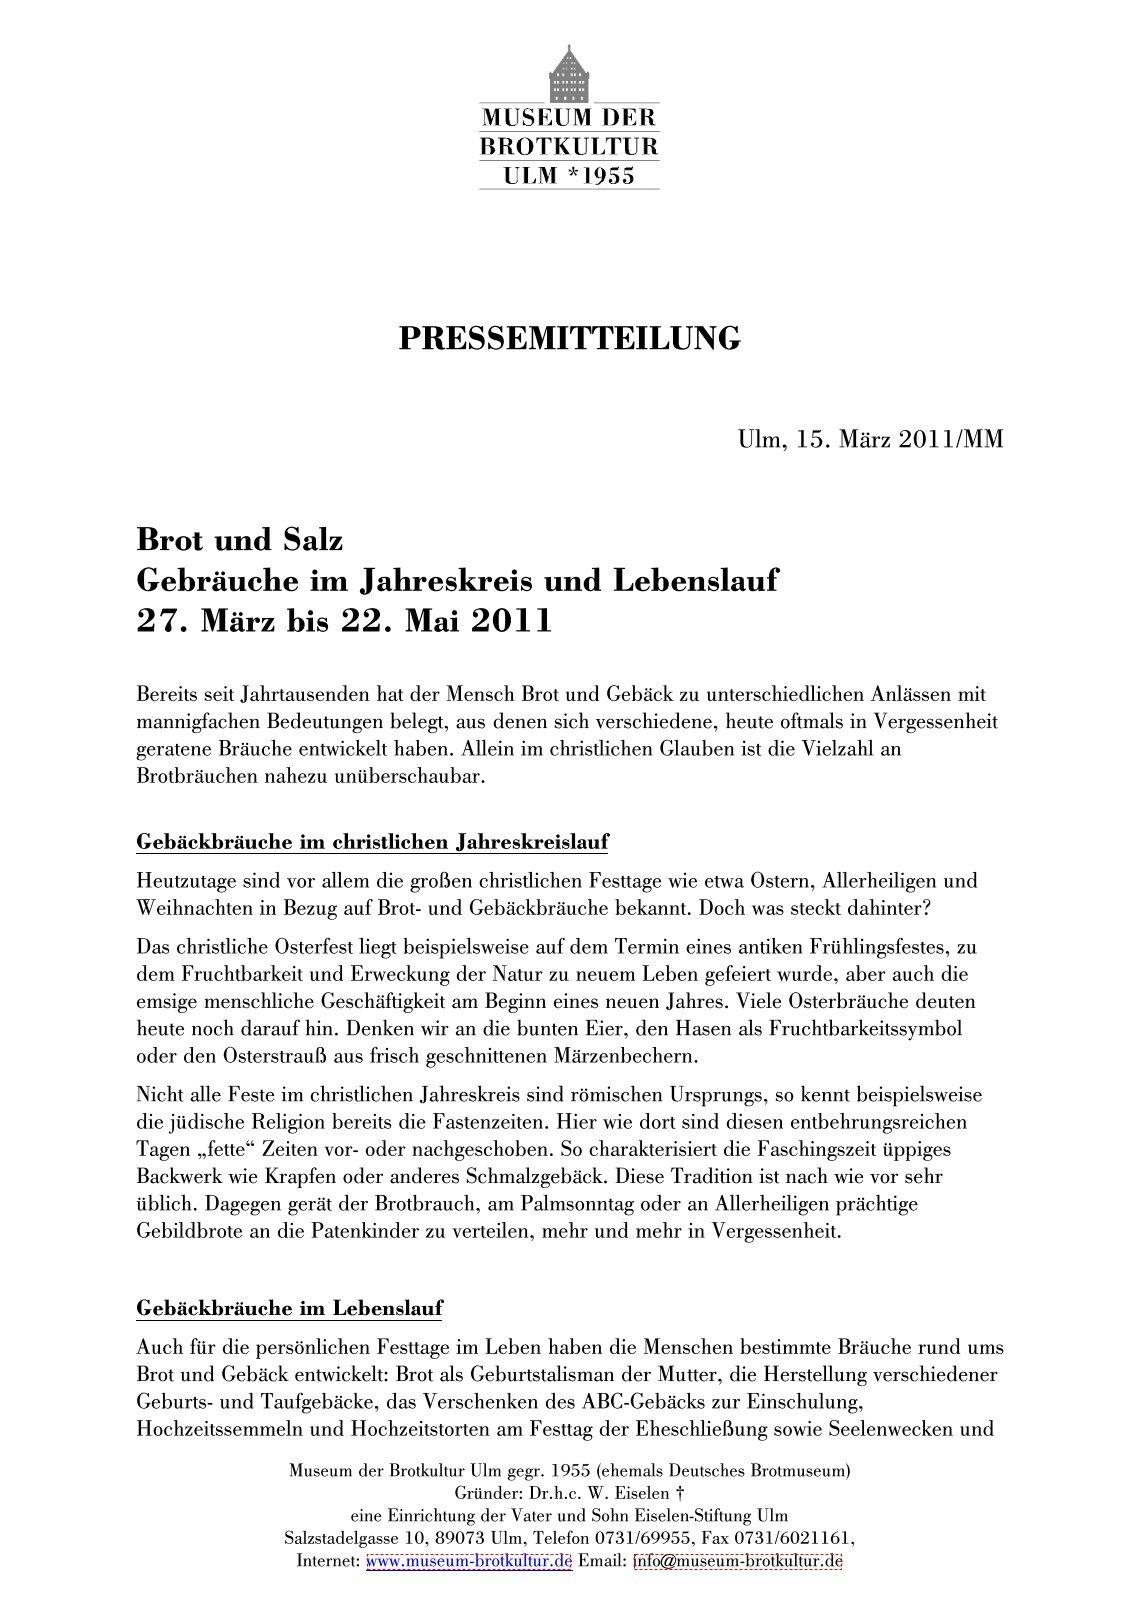 Großartig Biomedizinische Technik Regierung Lebenslauf Galerie ...